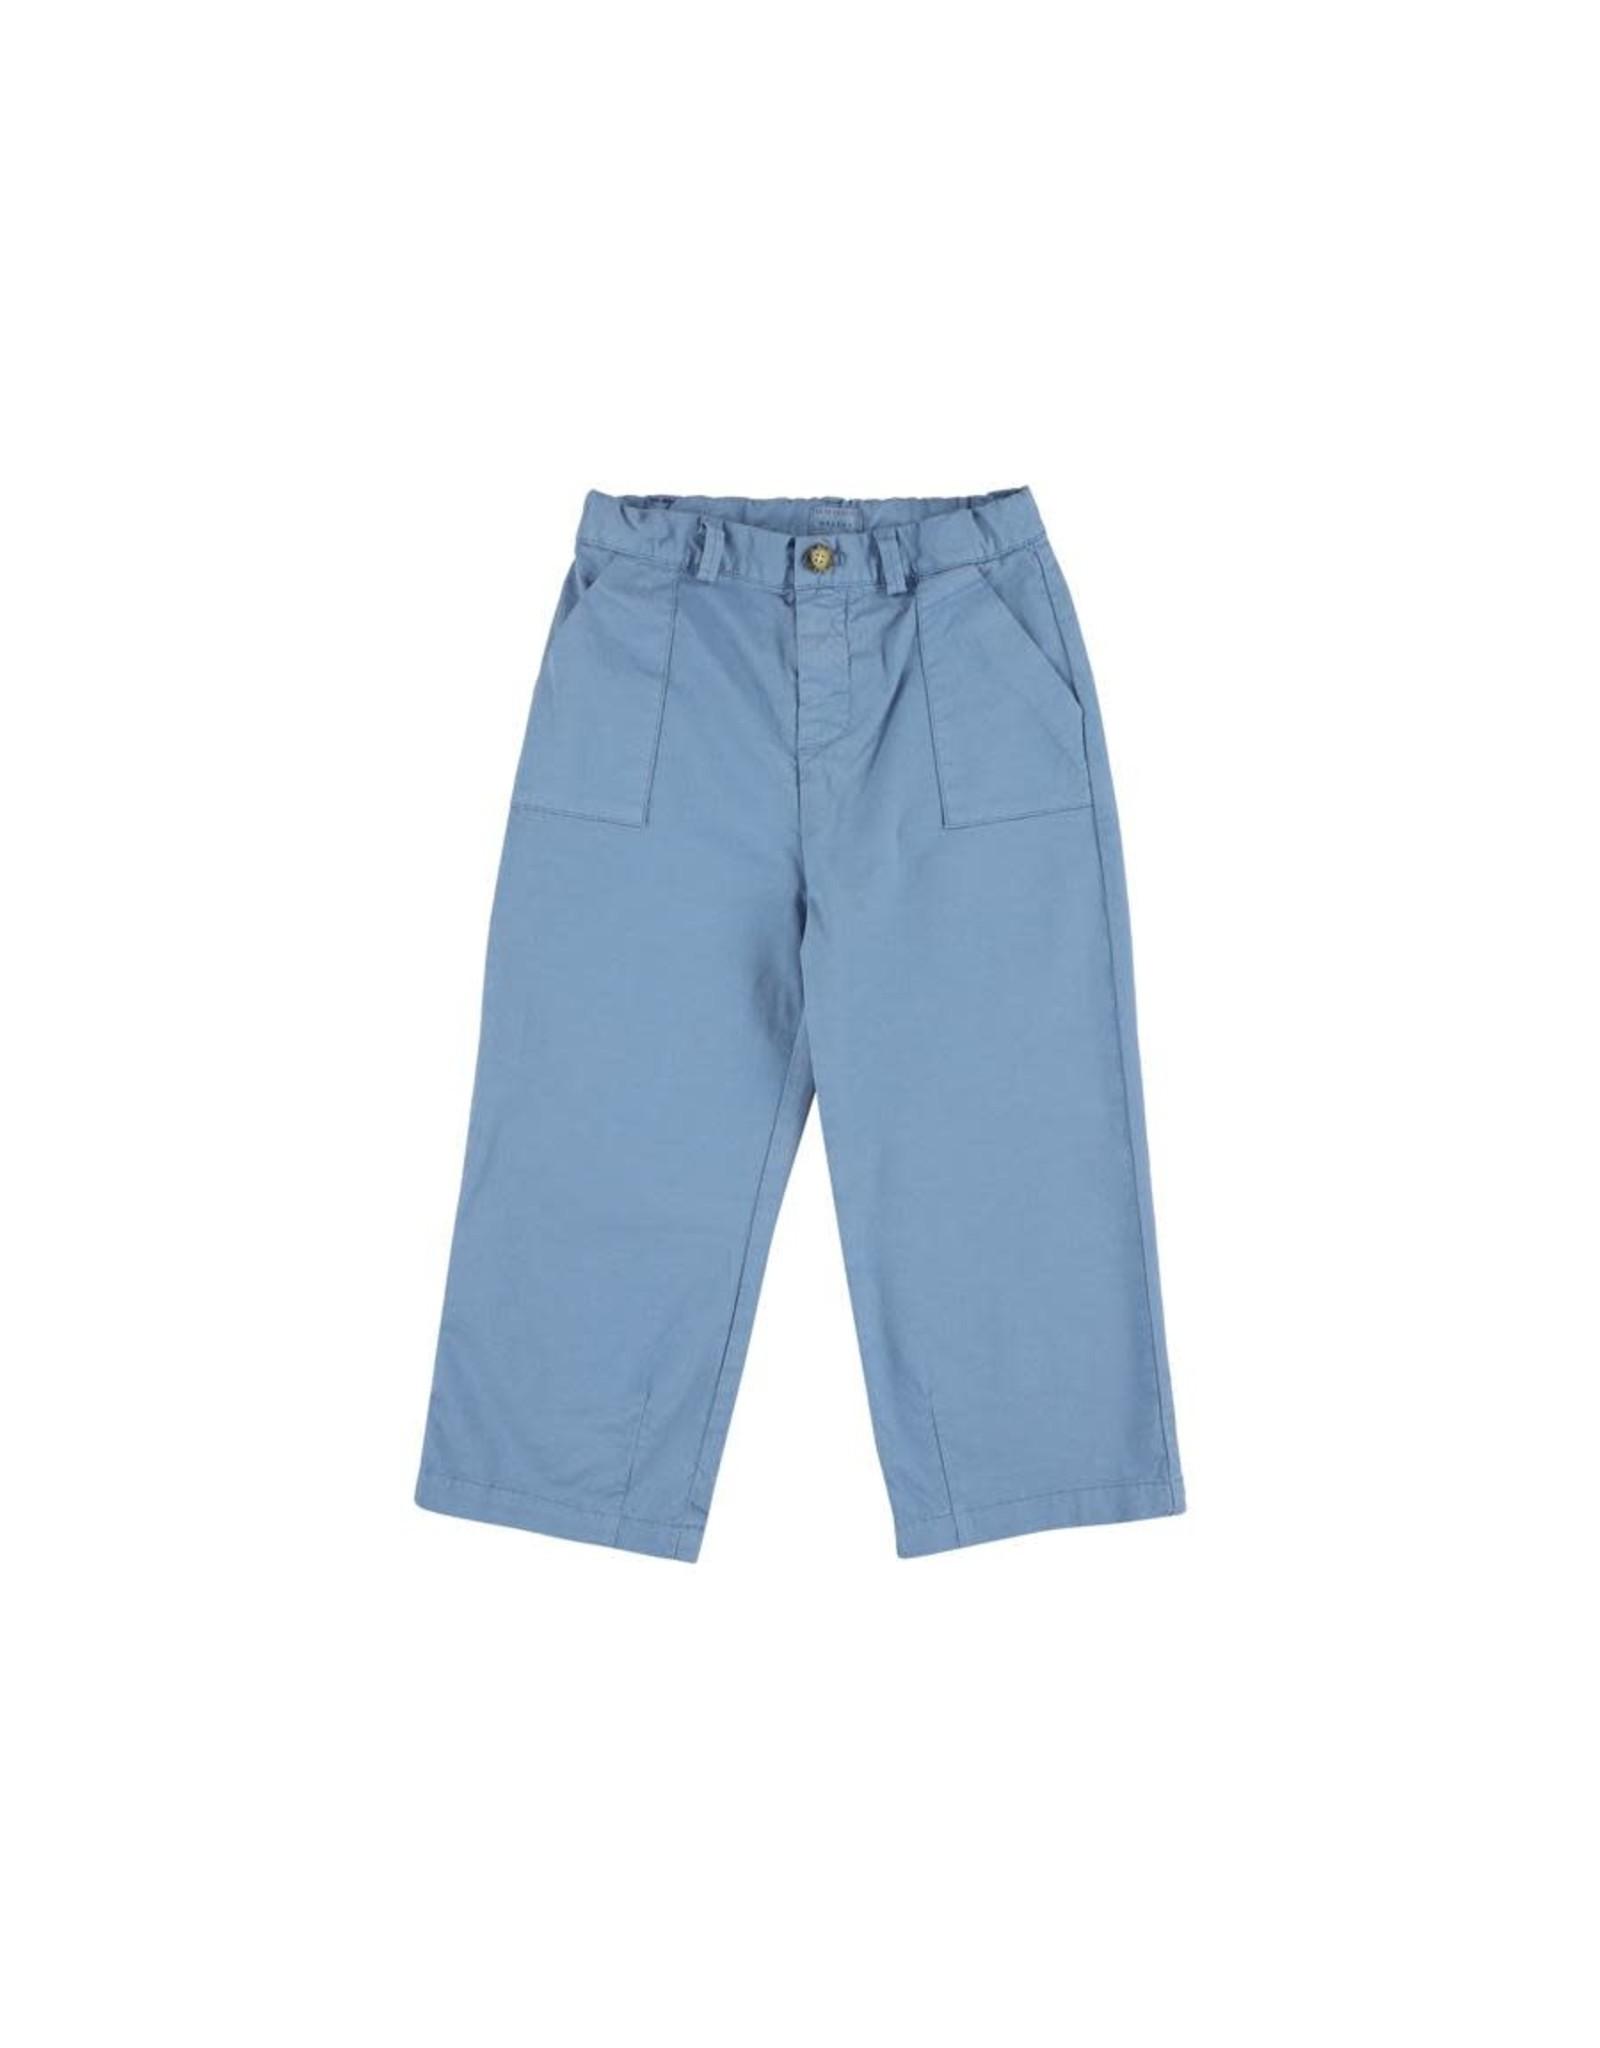 Morley Morley SS21 Major Geti Crees trousers